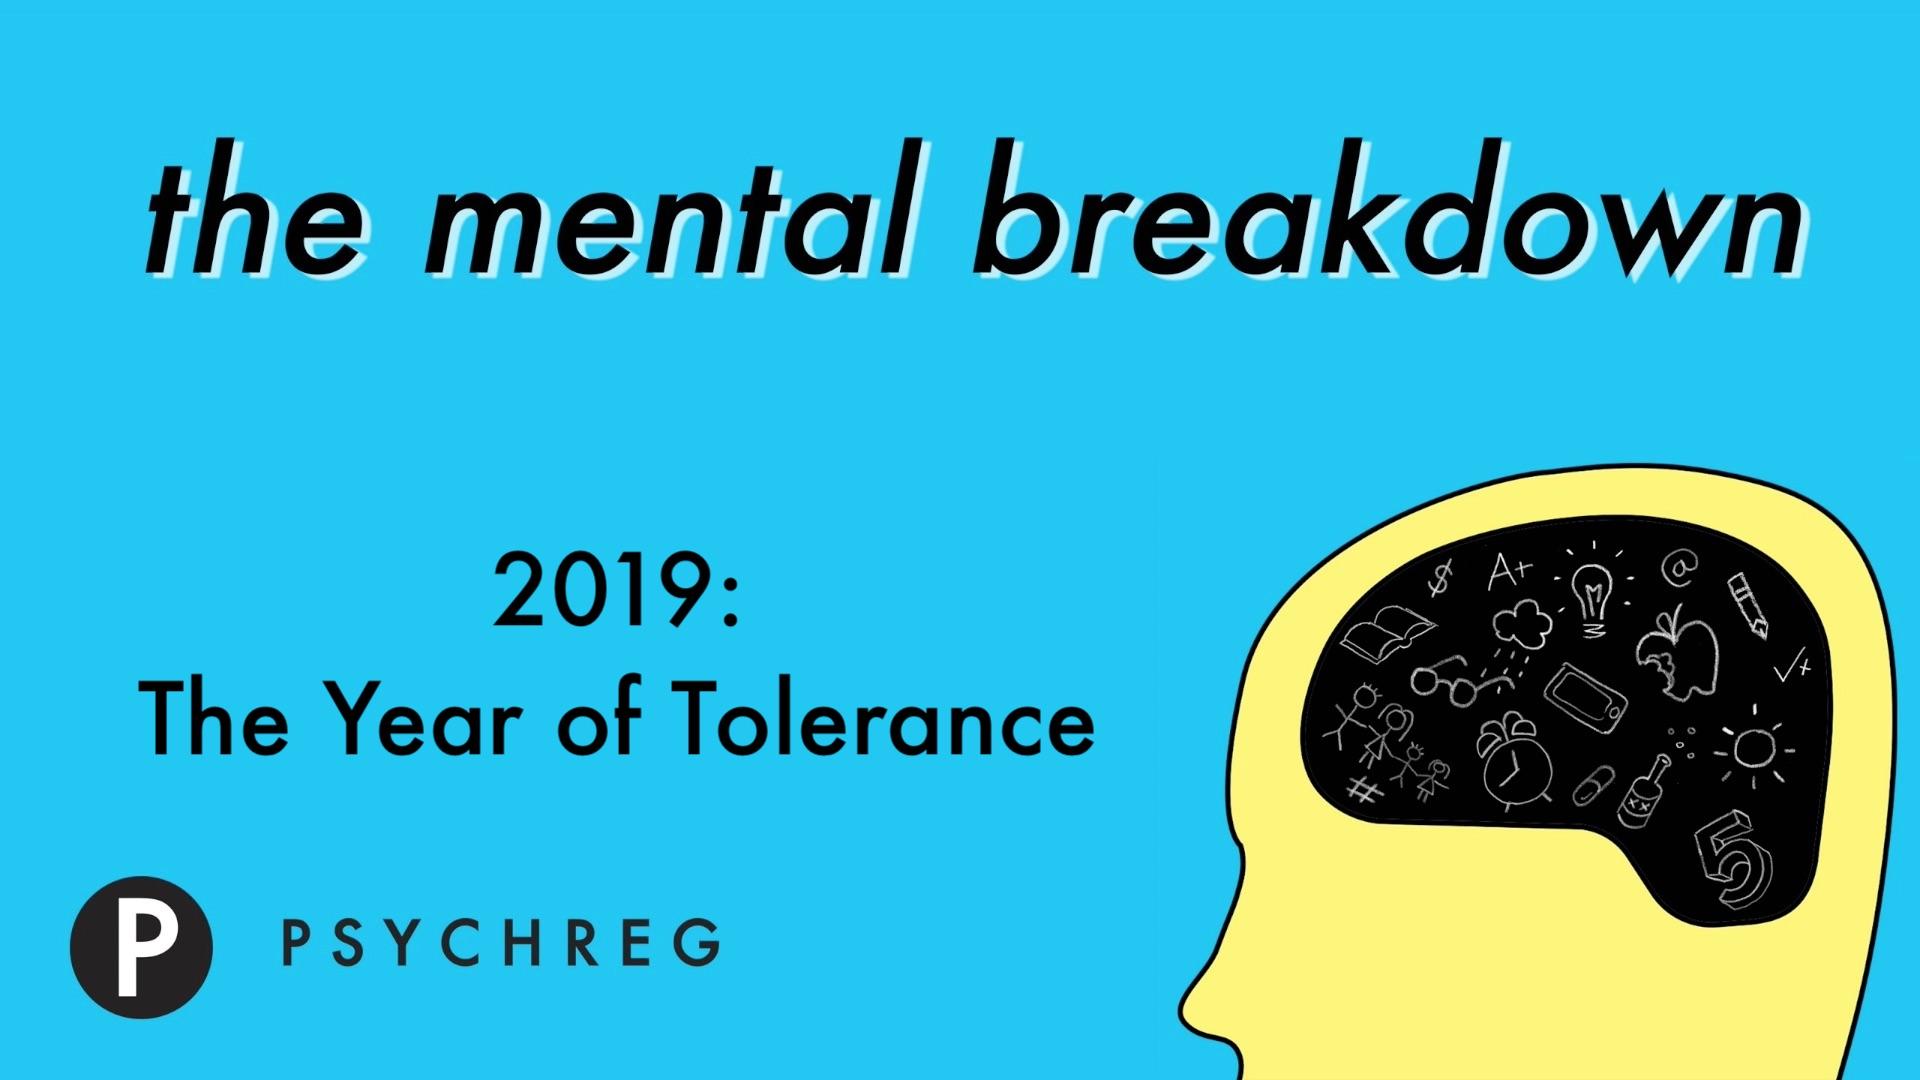 2019: The Year of Tolerance - The Mental Breakdown